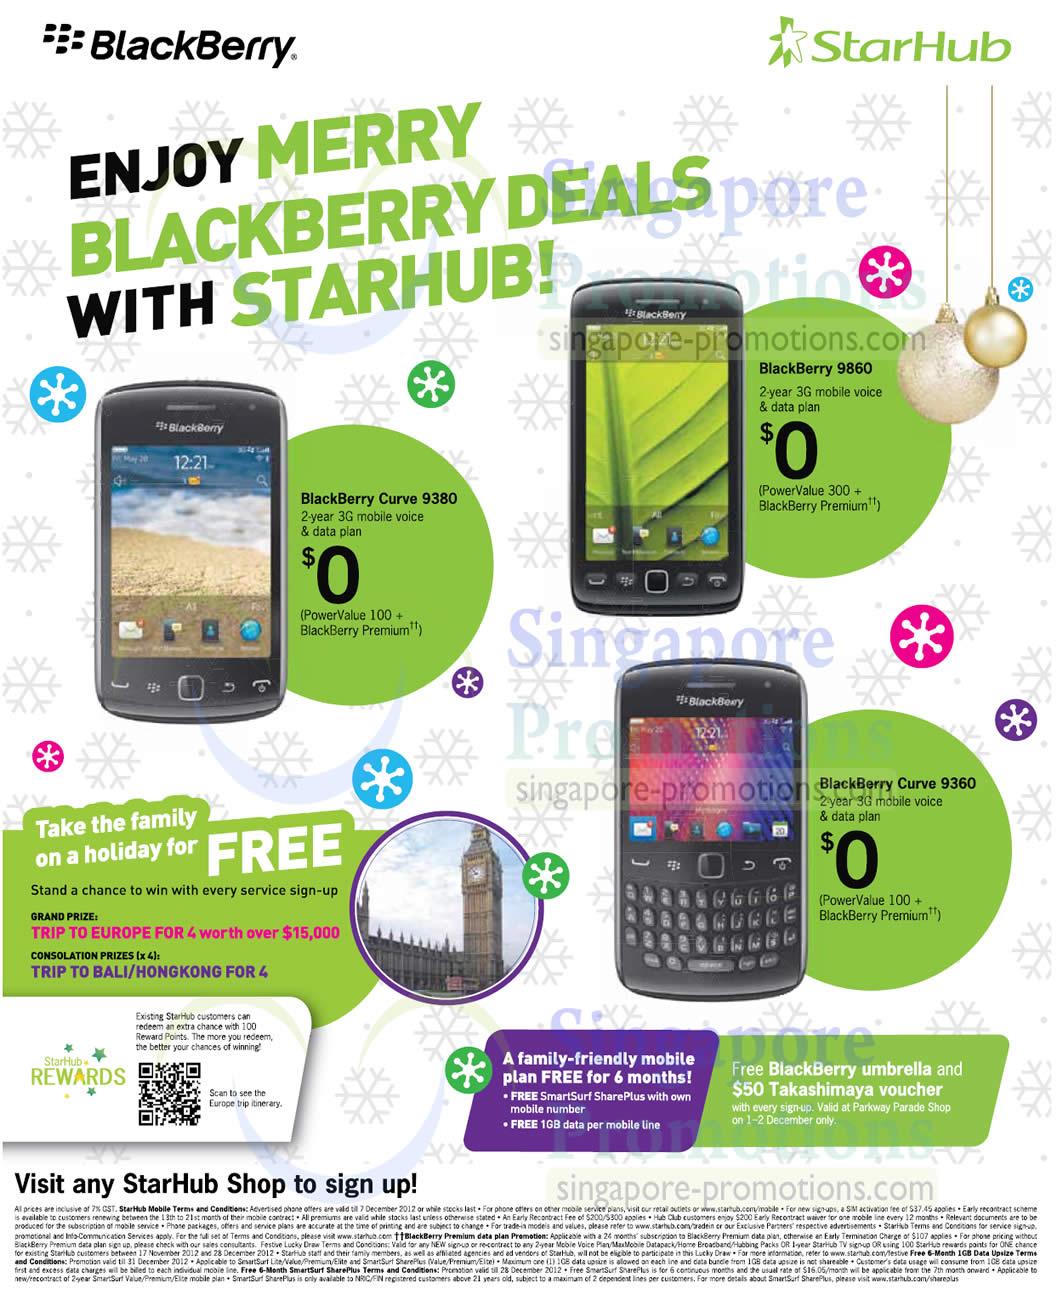 Blackberry Curve 9380, Blackberry Curve 9860, Blackberry Curve 9360